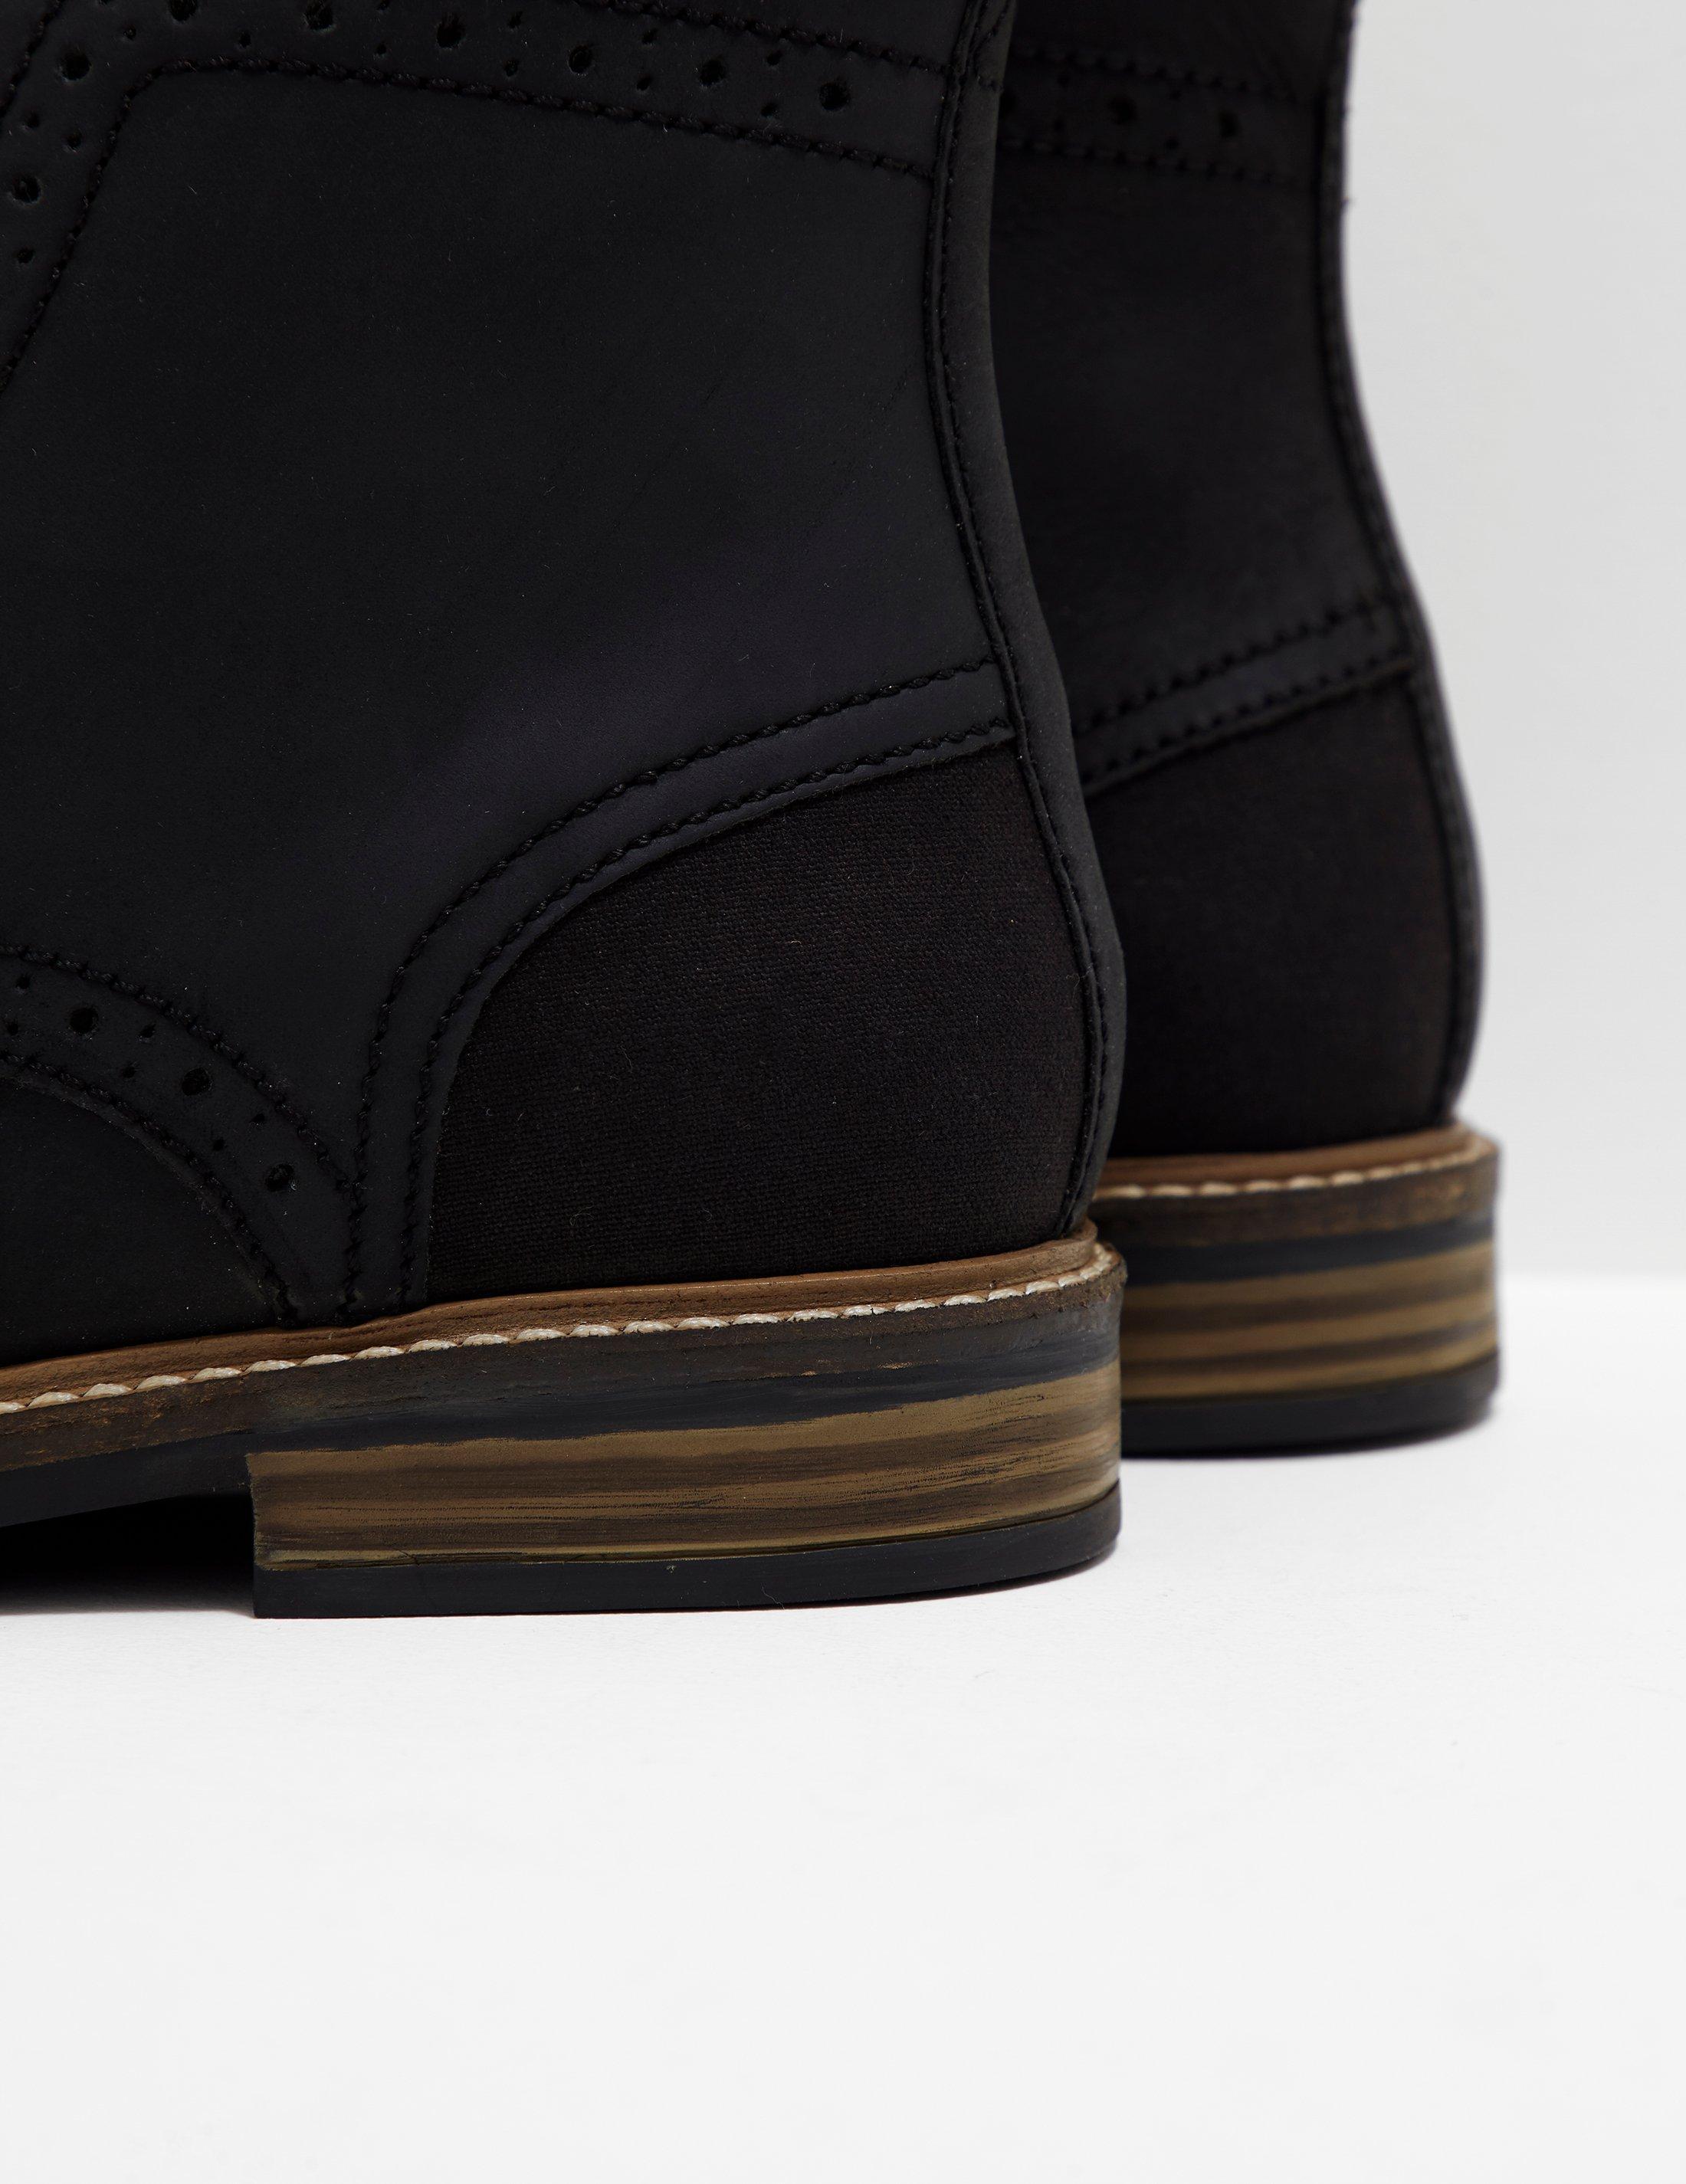 b8189ce63c8 Barbour Belsay Boots in Black for Men - Lyst